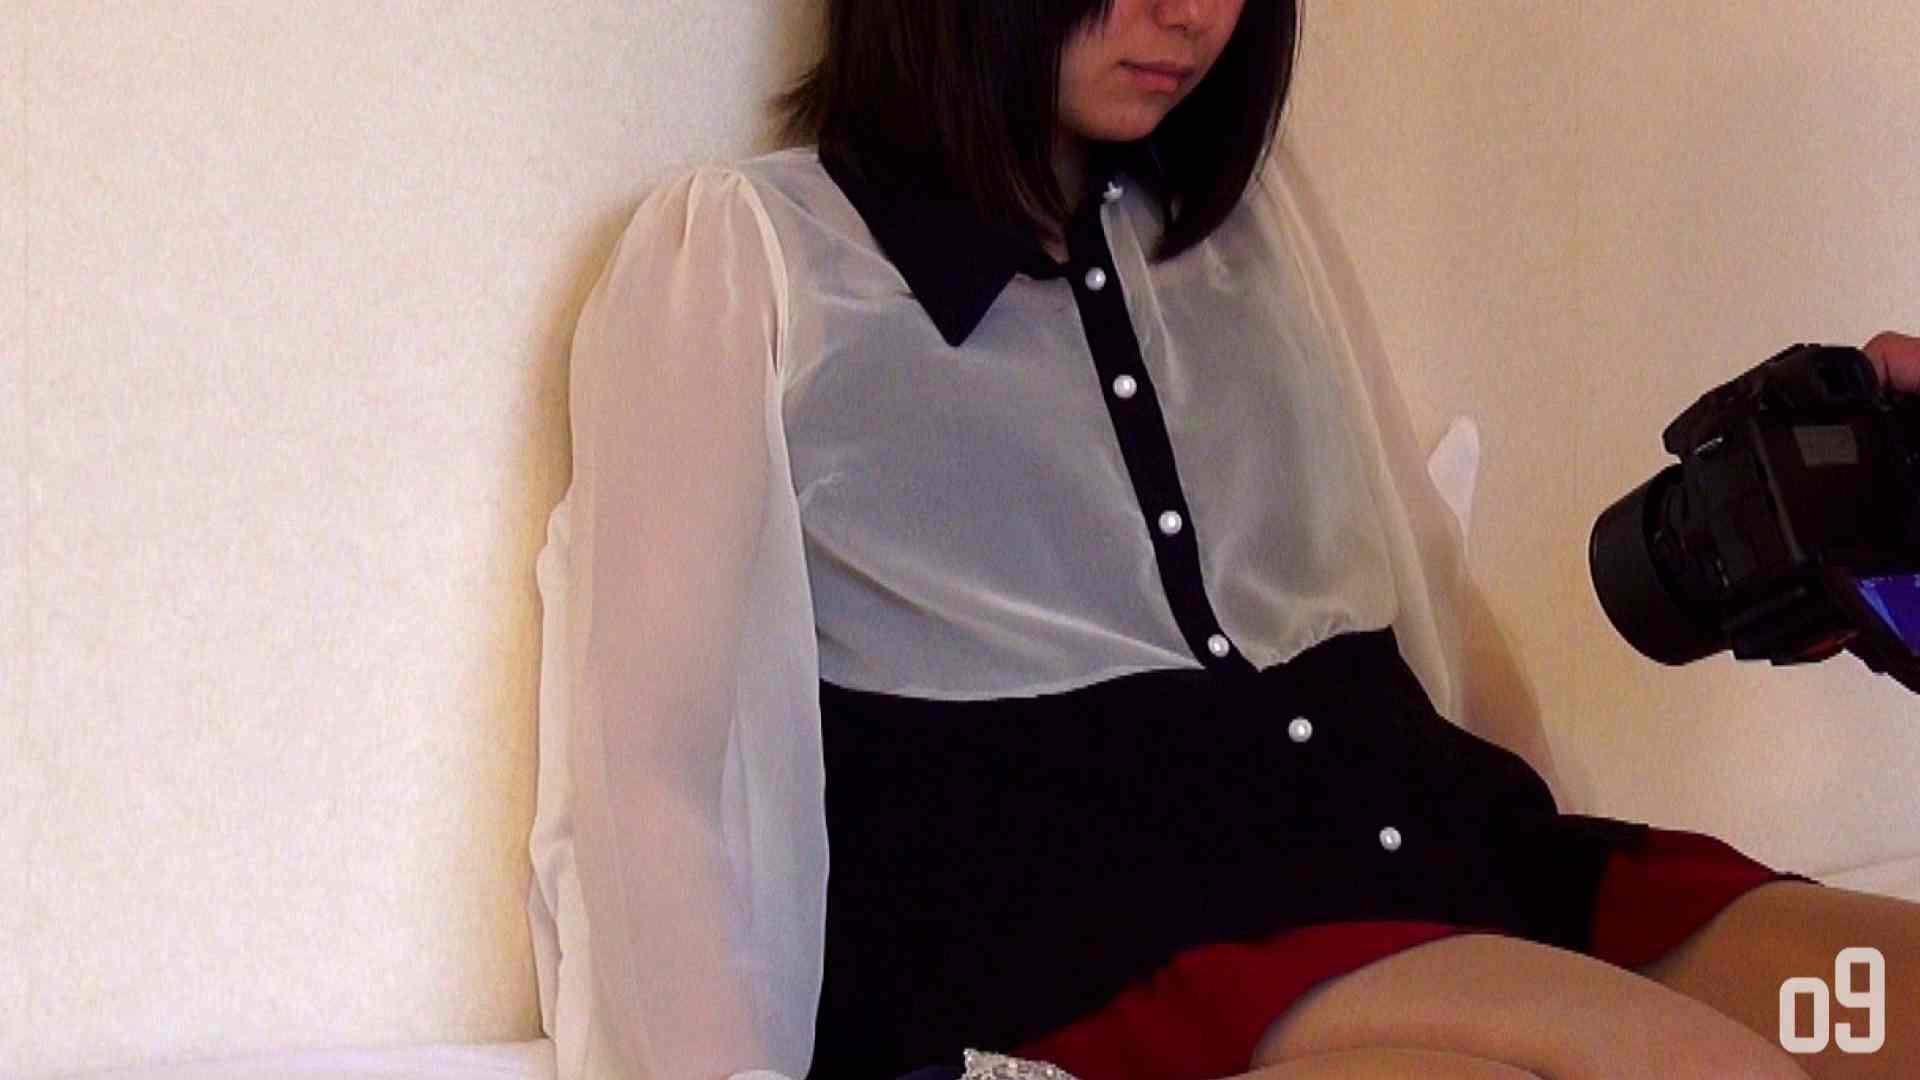 vol.1 撮影内容未確定の中、まずは私服姿撮り エッチなOL | 顔出しNG一般女性  80pic 35